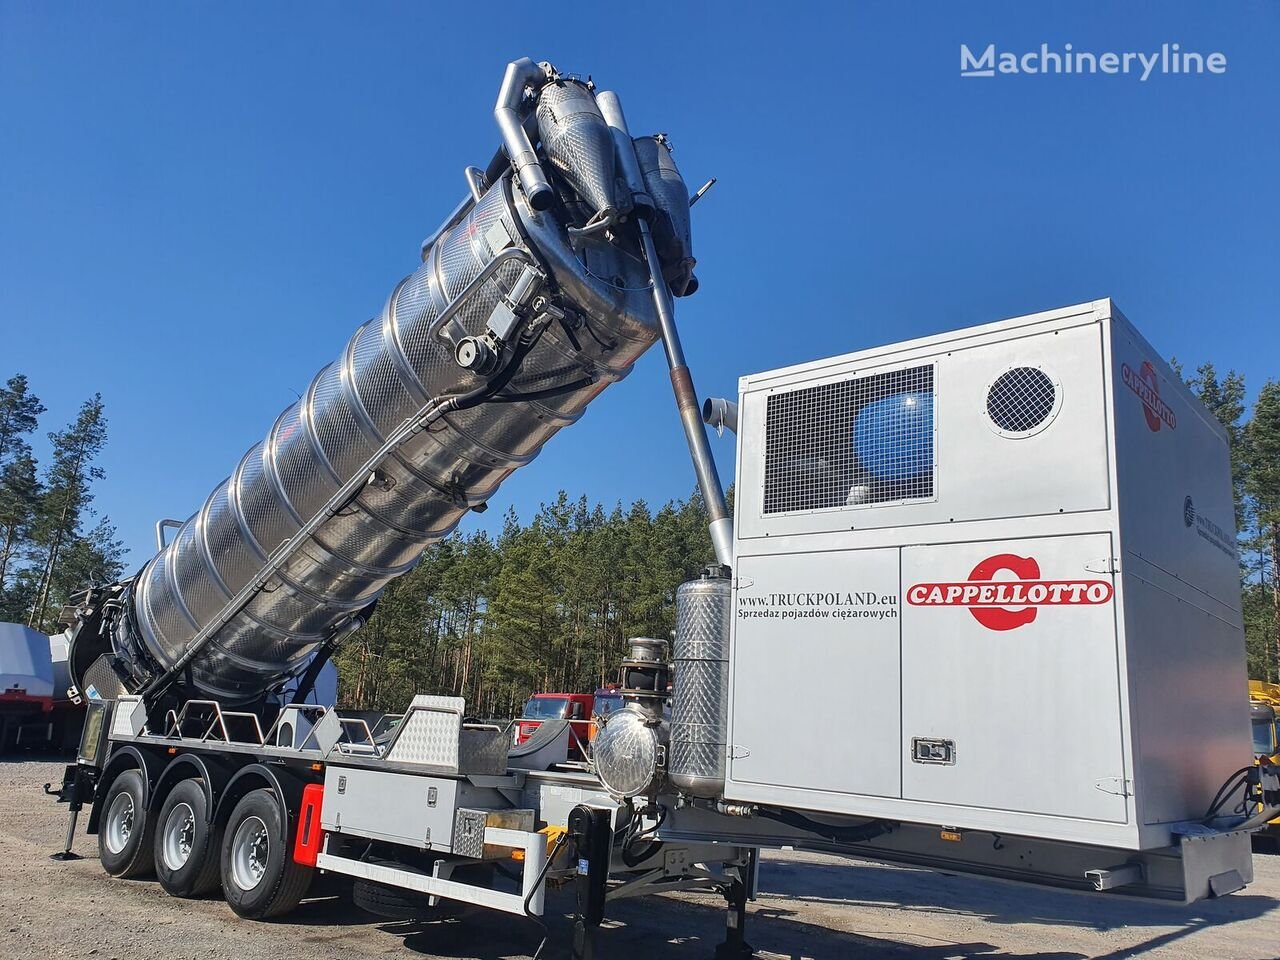 SCANIA CAPPELLOTTO CAP 2500  ADR Specjalistyczna autocysterna do przewo camion de desatascos